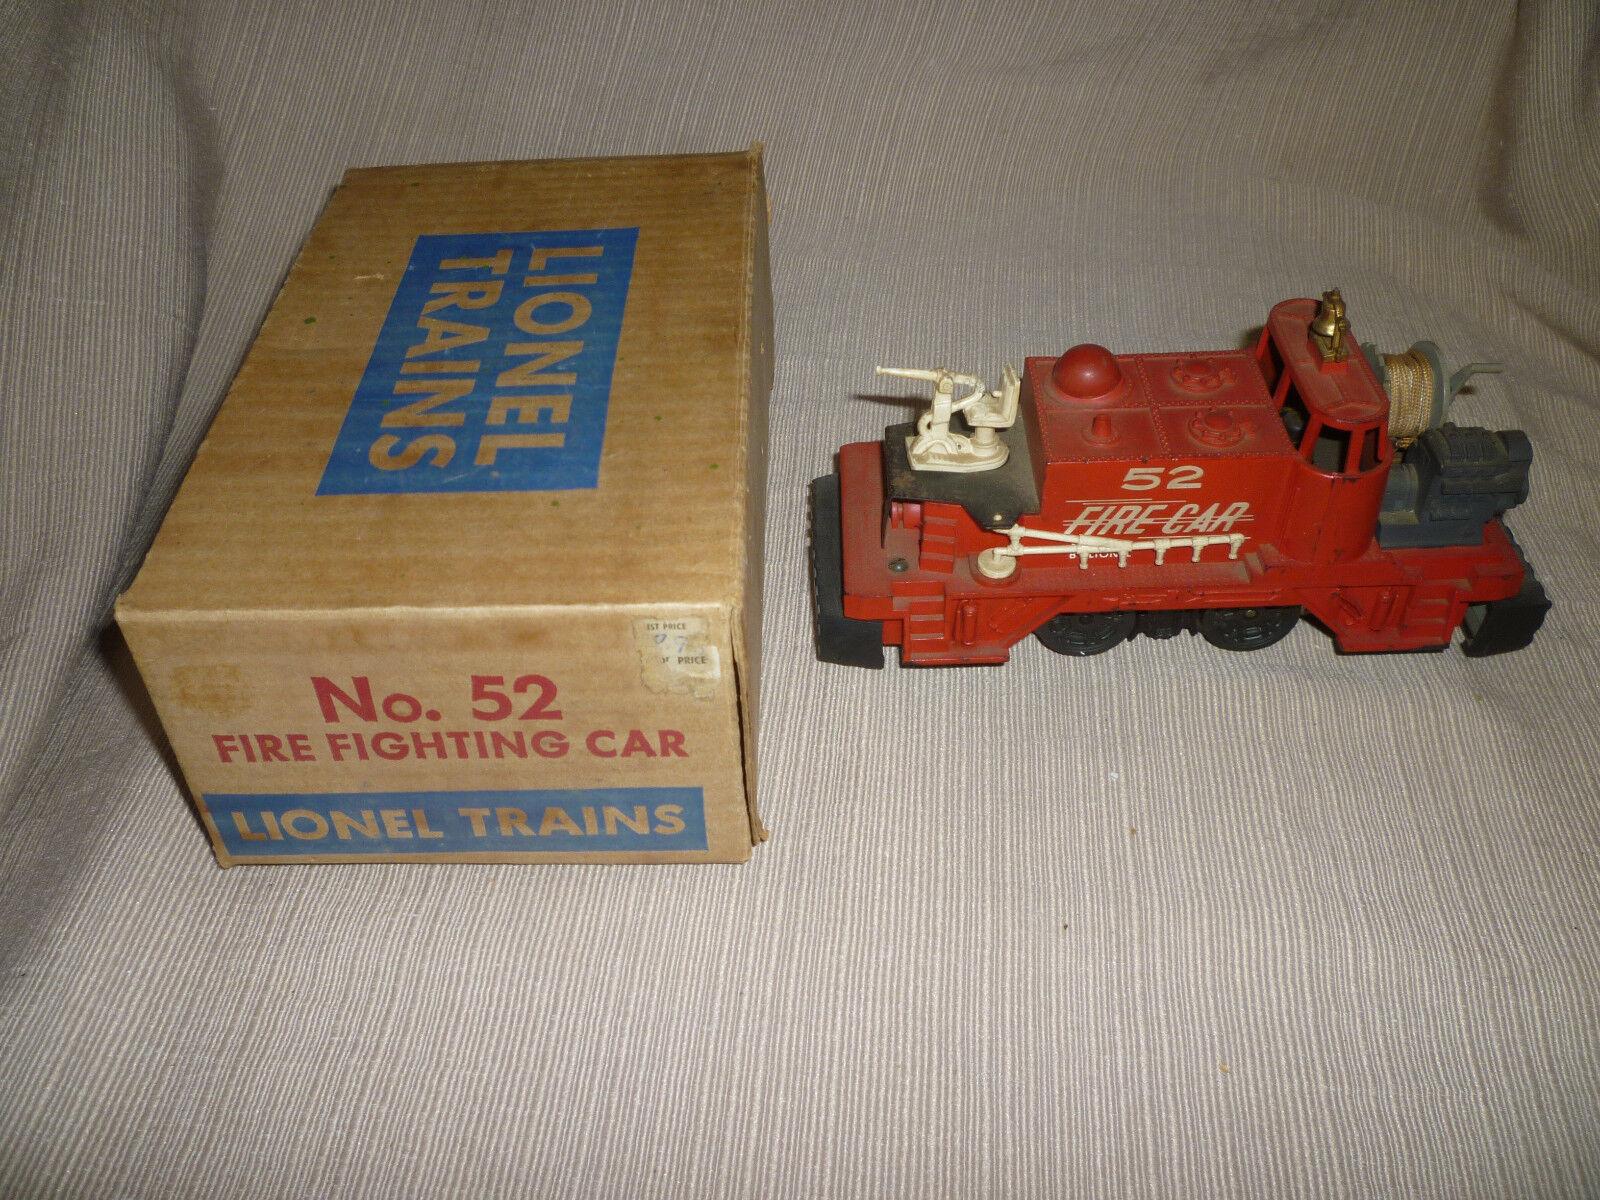 Vintage Postwar Lionel Fire Car in Original Box